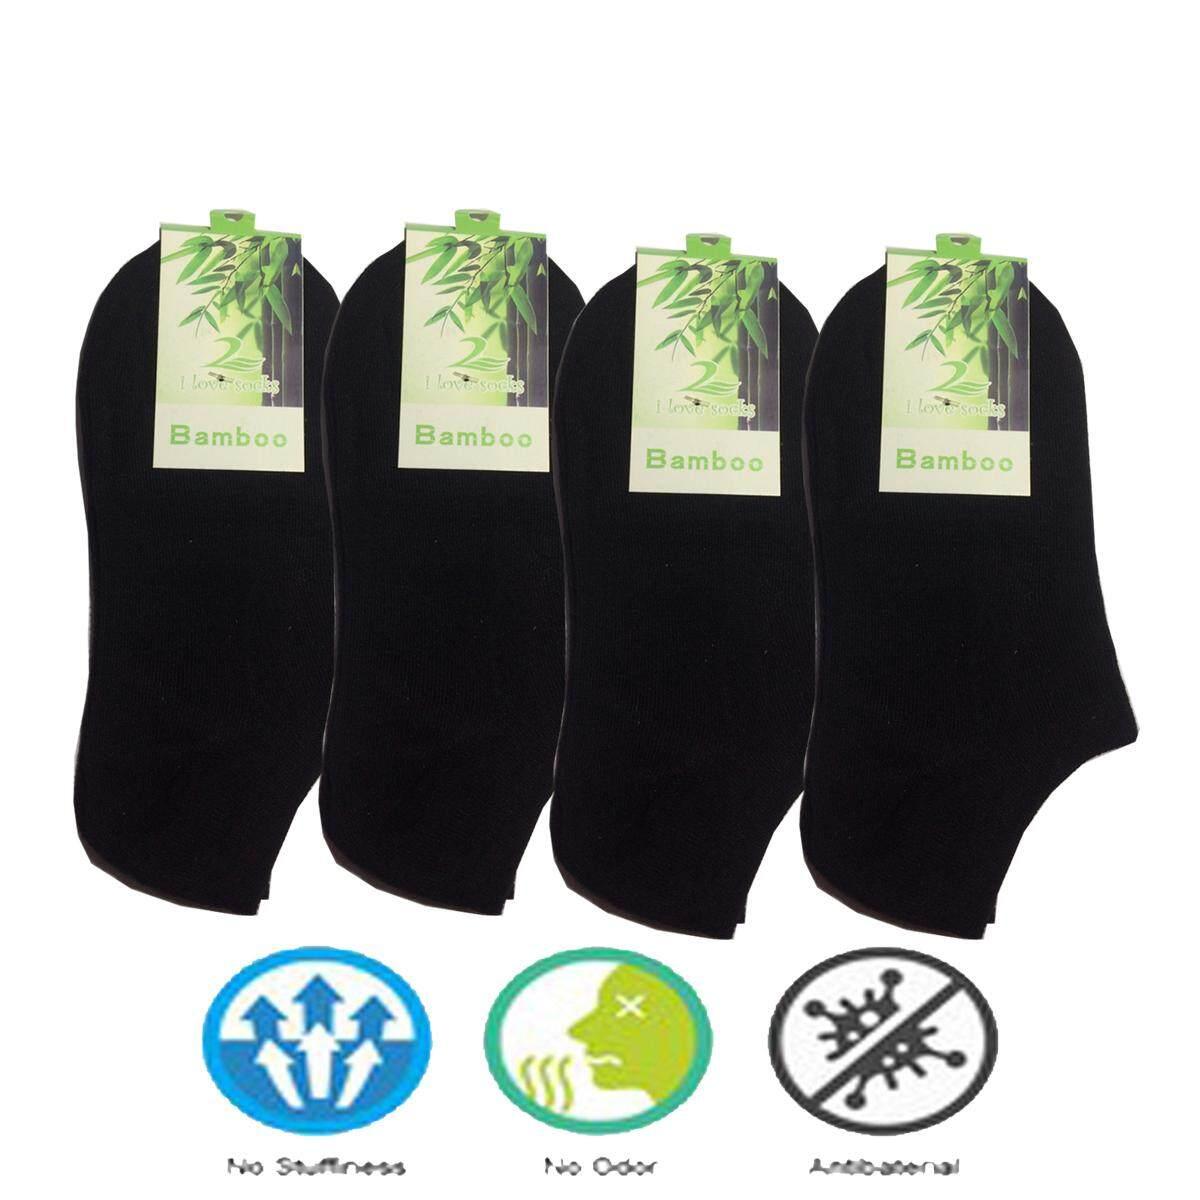 Bamboo Fiber socks ถุงเท้าใยใผ่ ข้อสั้น ช่วยลดกลิ่นเท้า แพ็ค 12 คู่